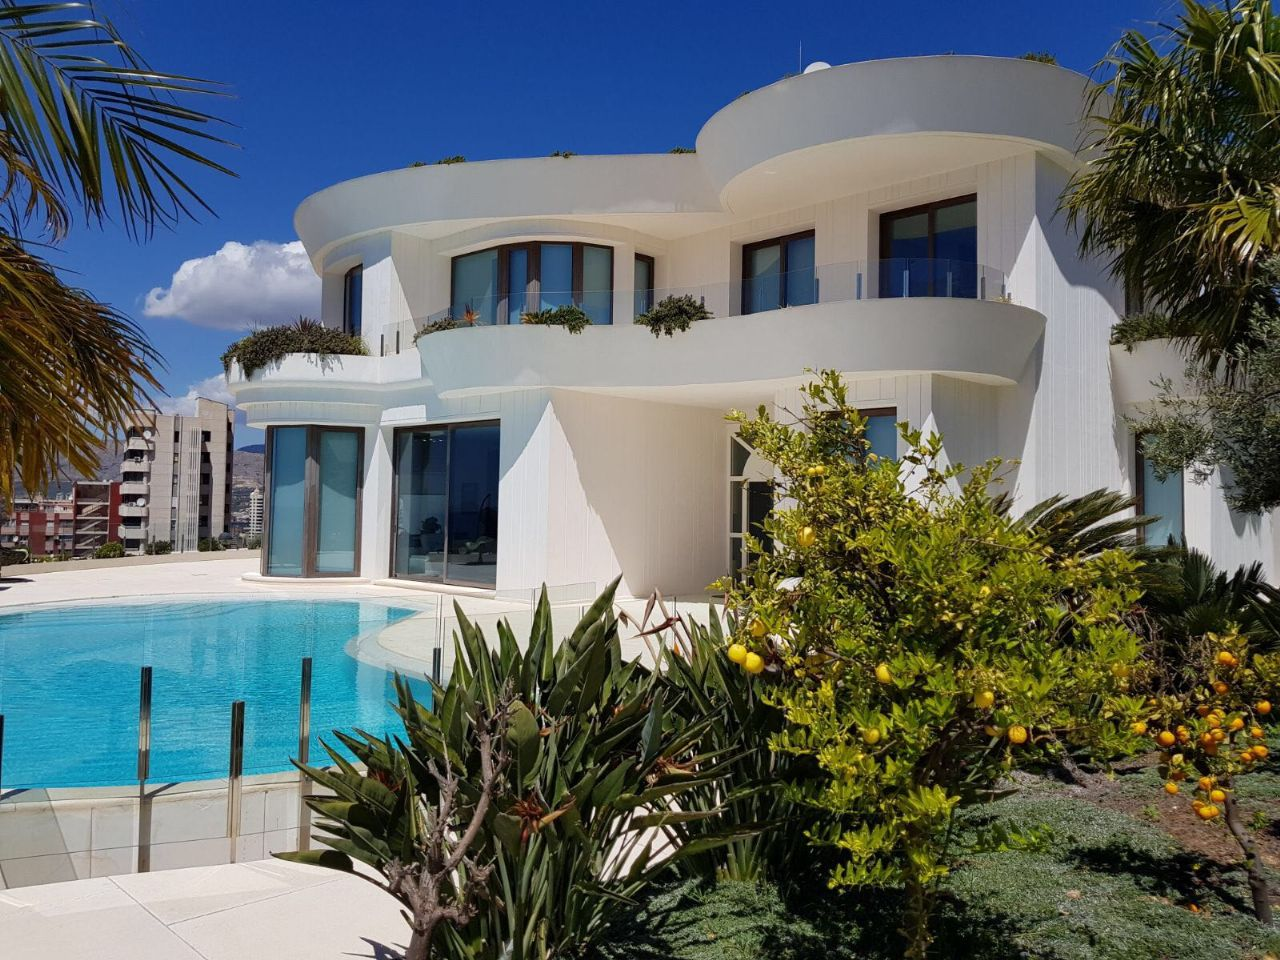 Villa in Benidorm, RINCON DE LOIX, verkauf